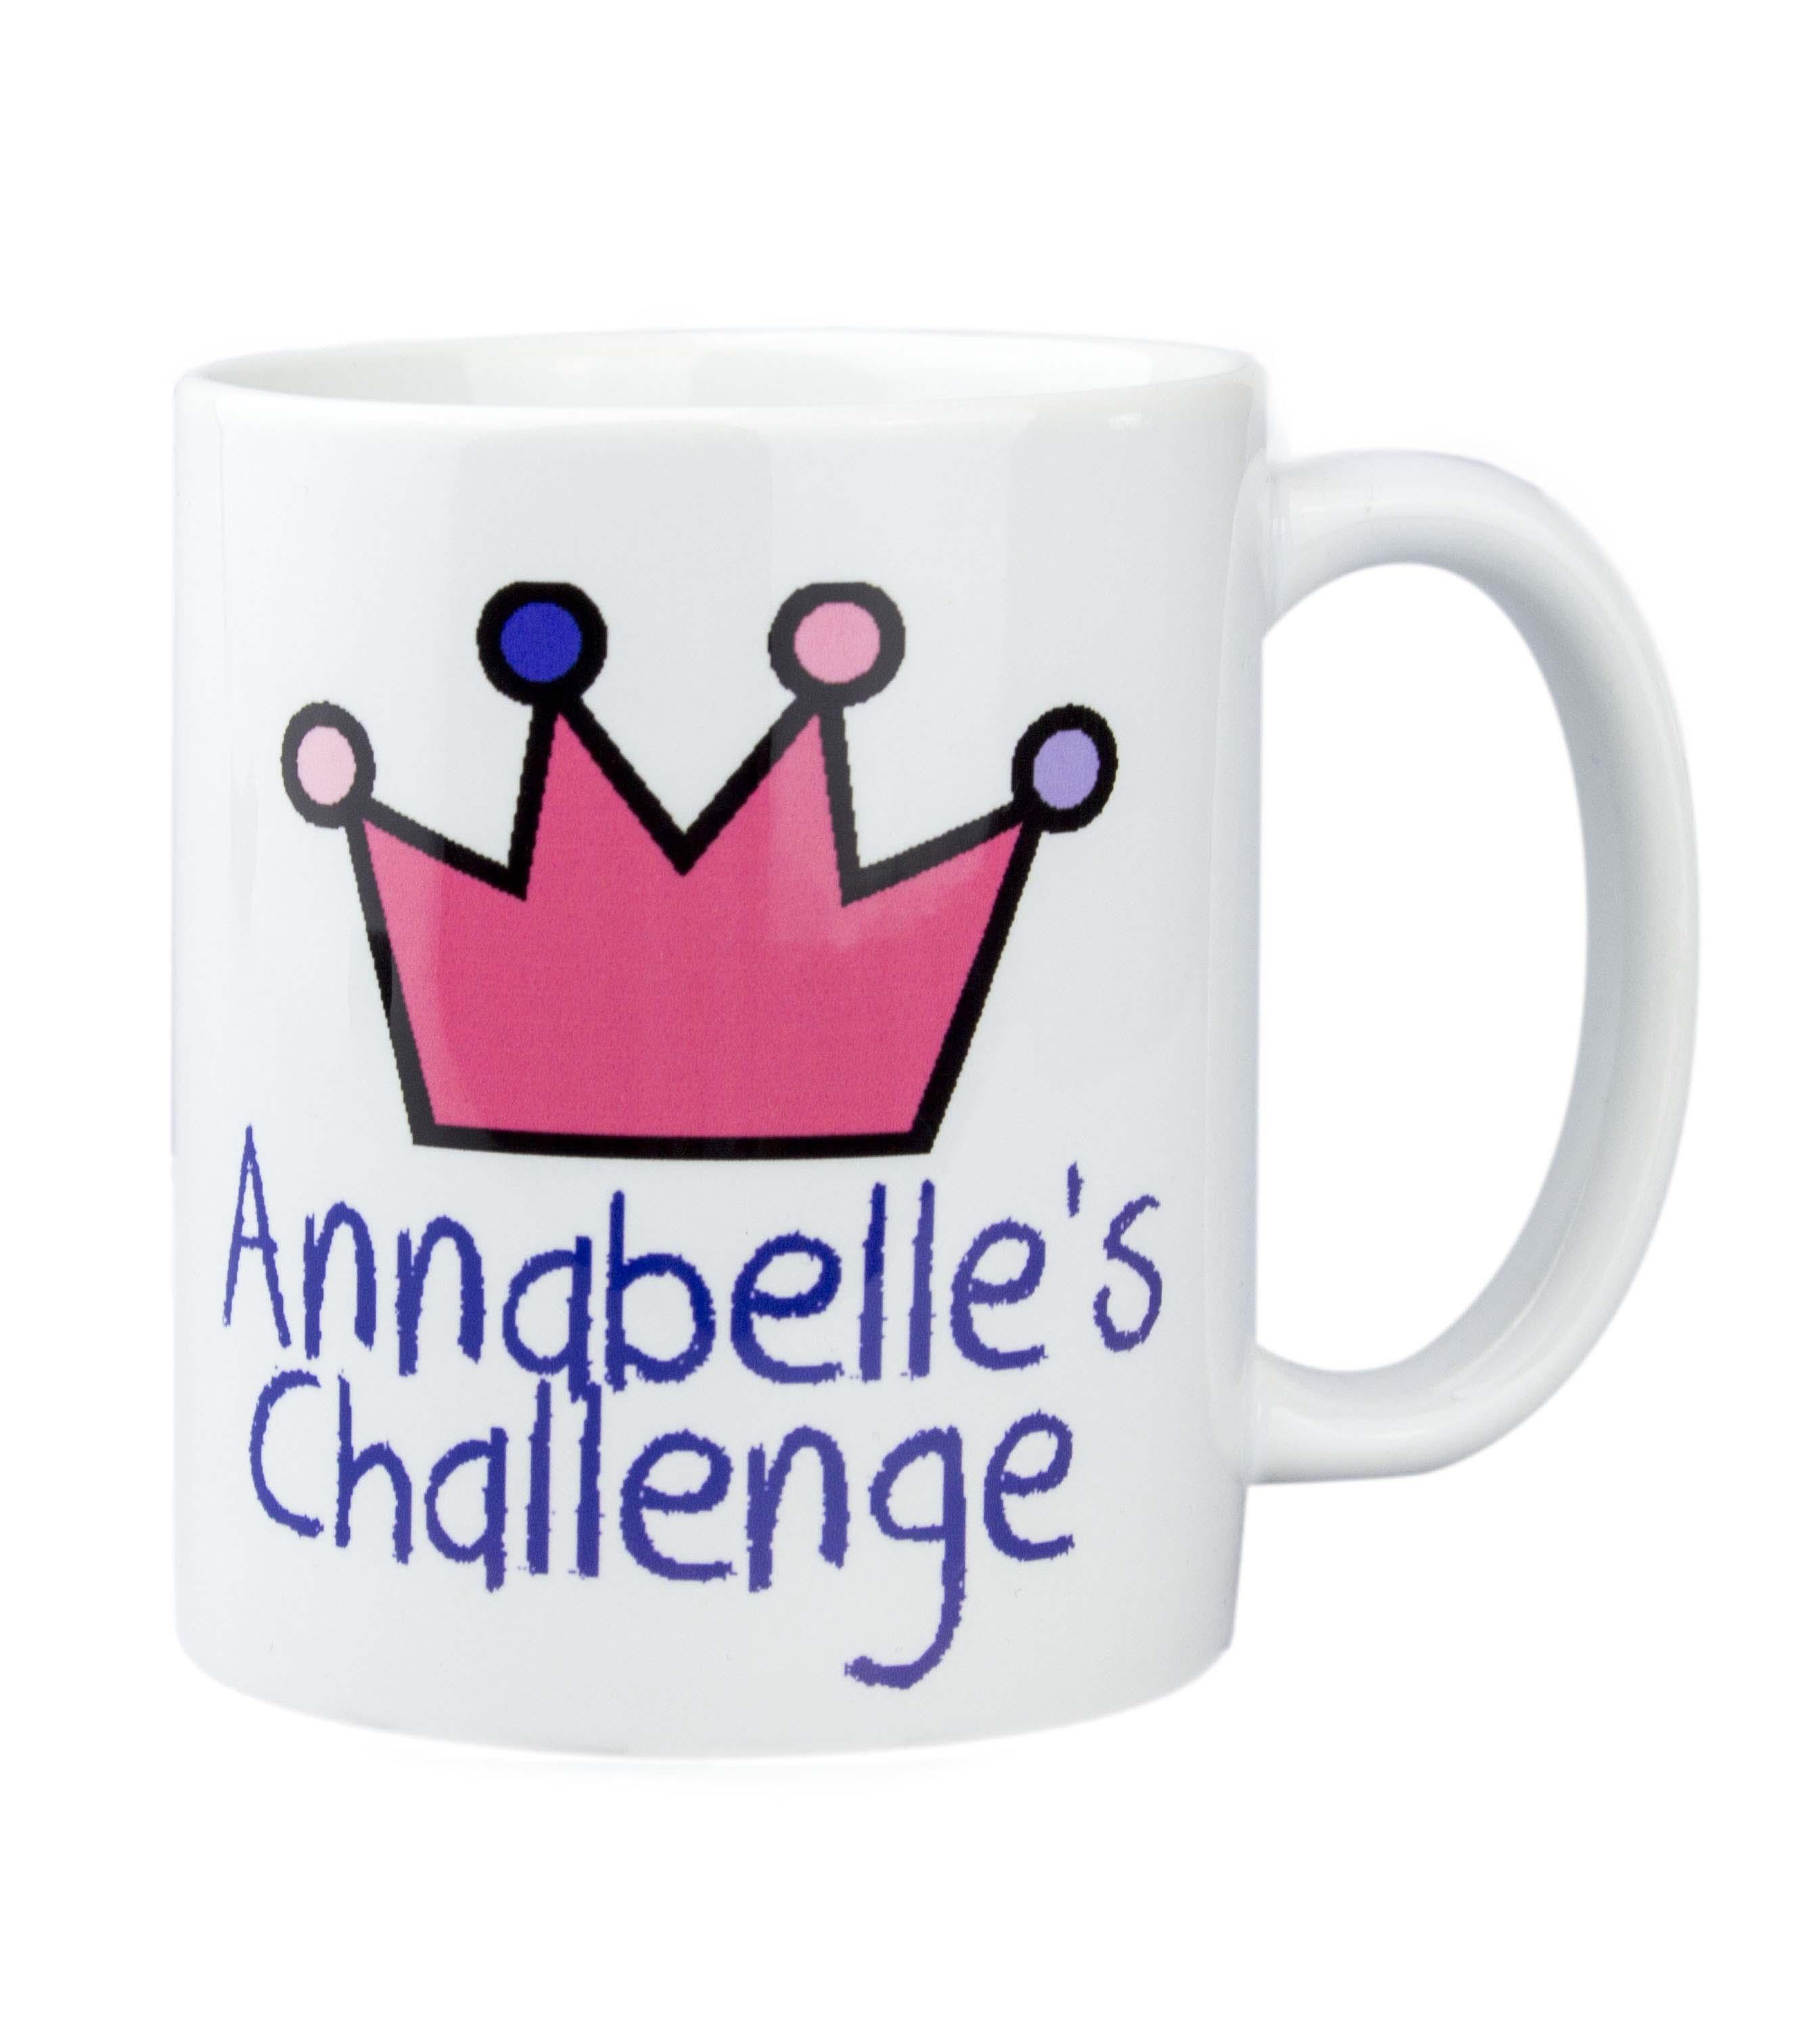 Annabelle's Challenge 11oz Mug